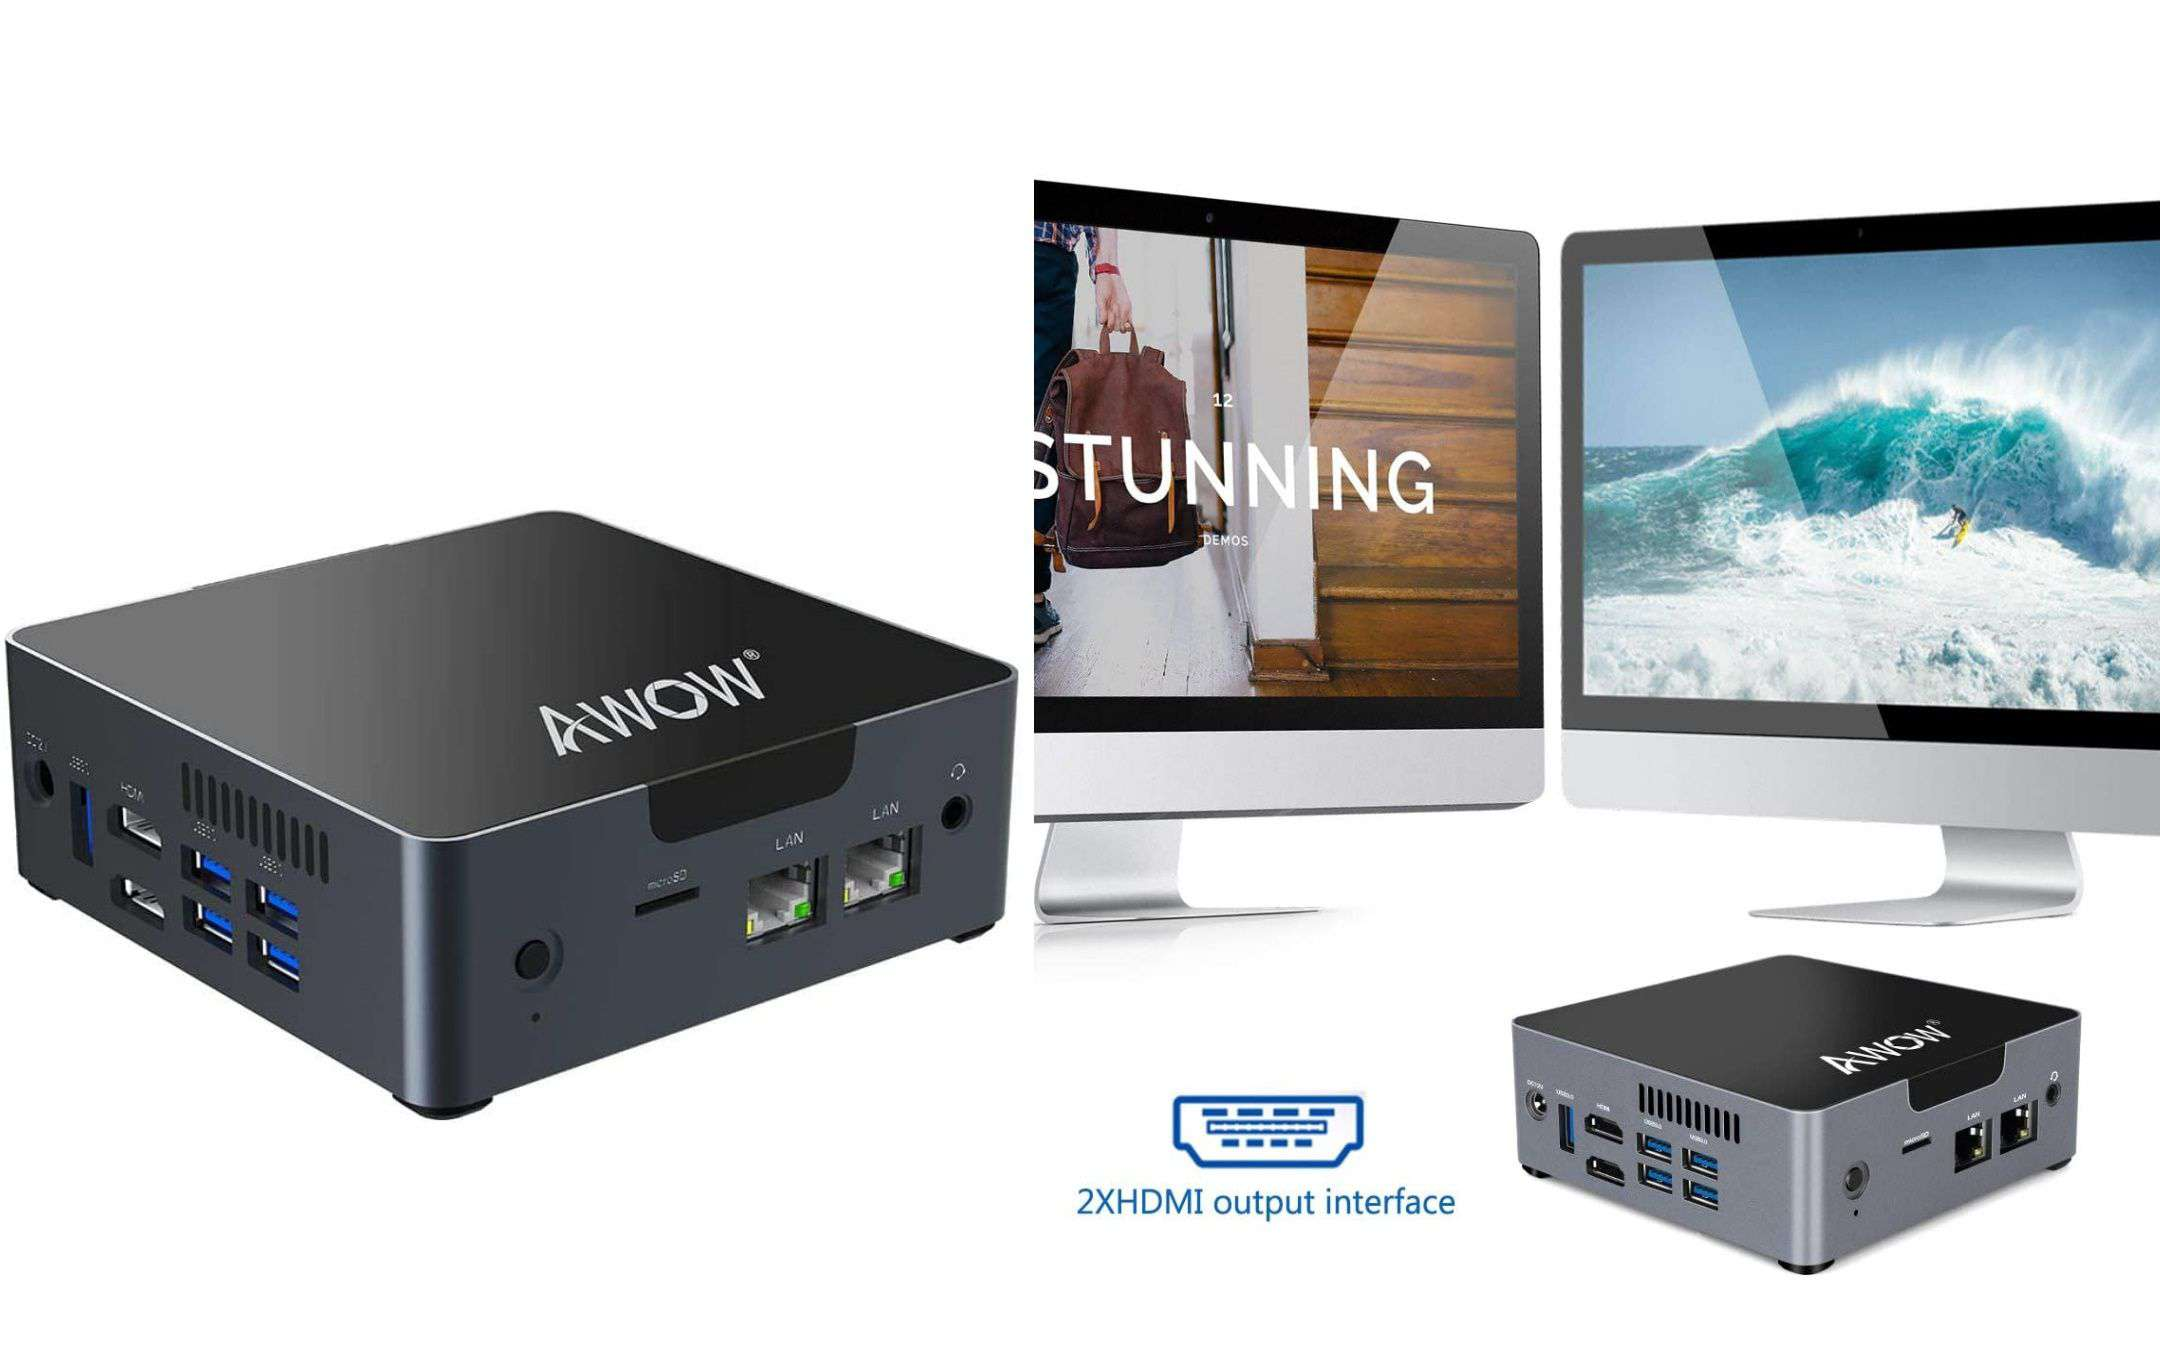 Mini PC with Intel quad core for less than 200 euros